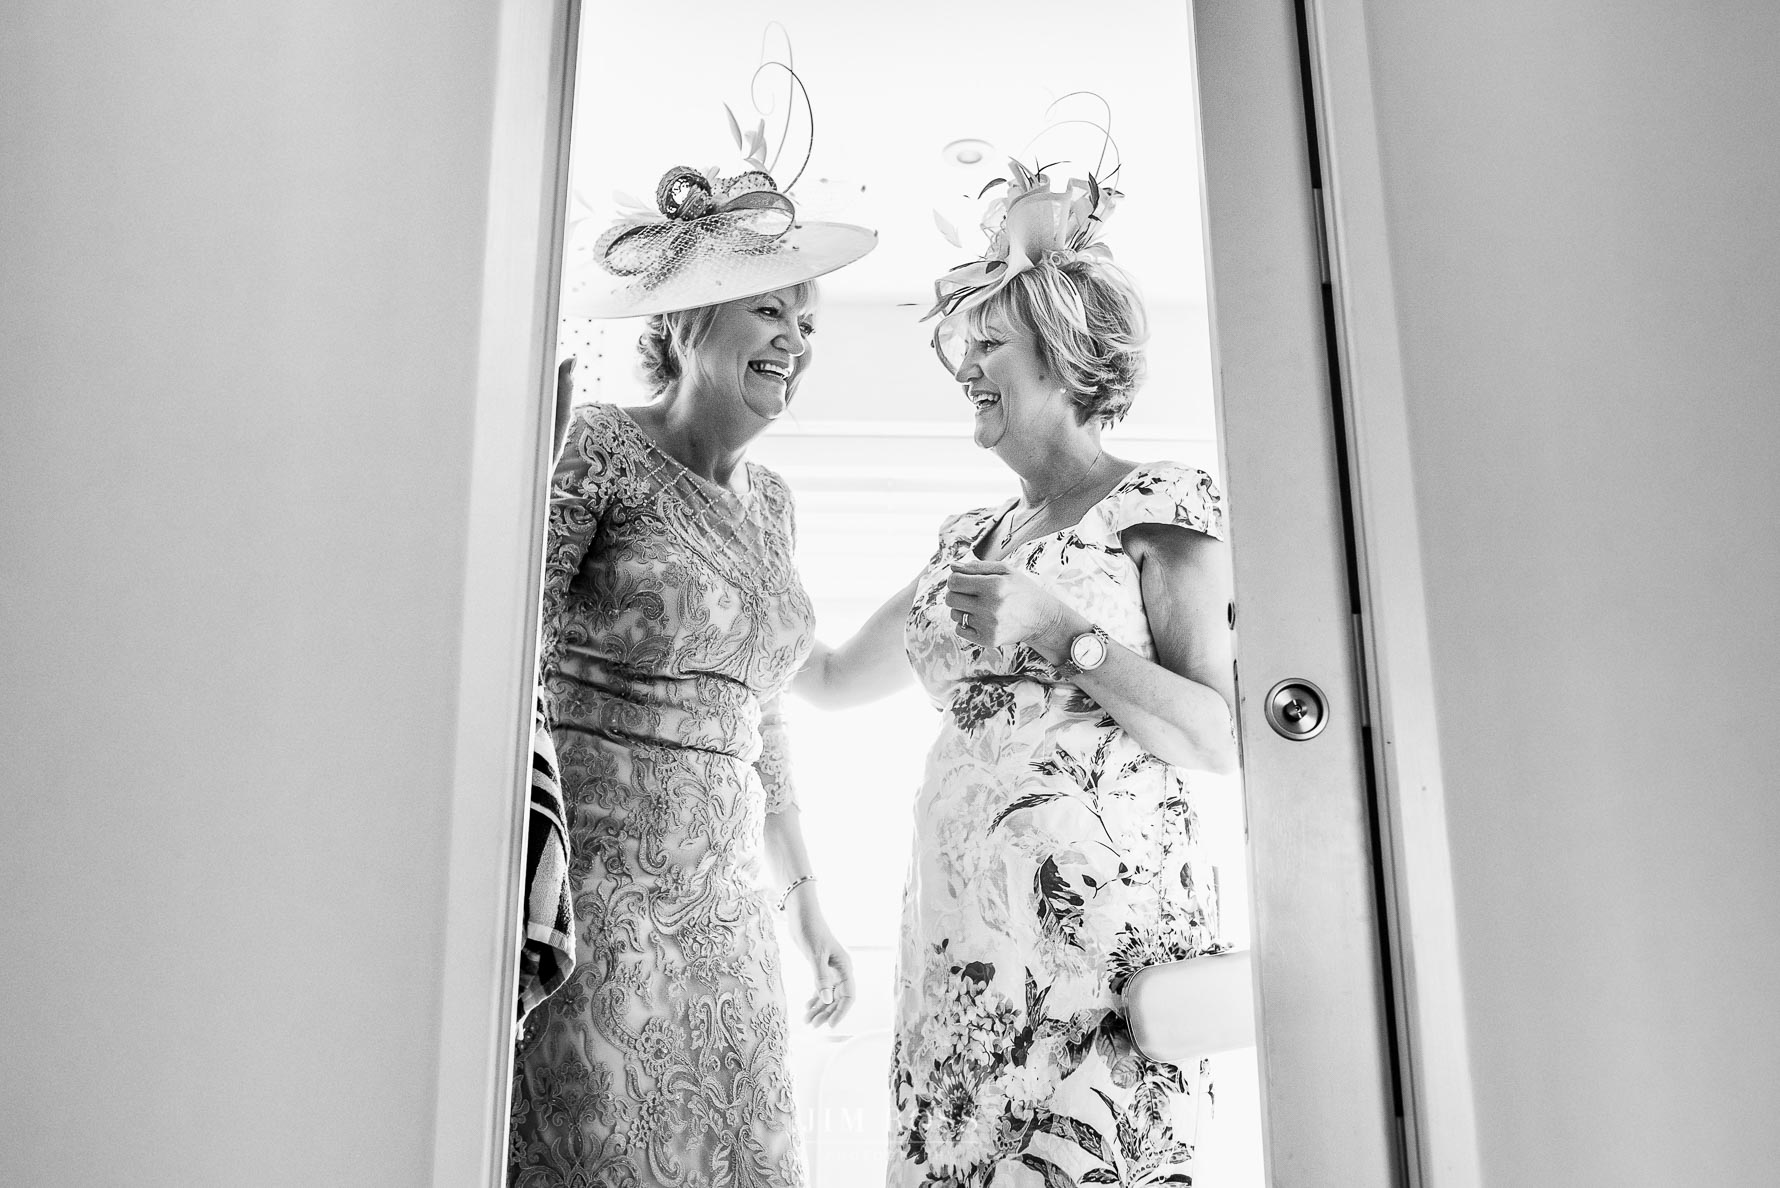 Twins in their wedding finery